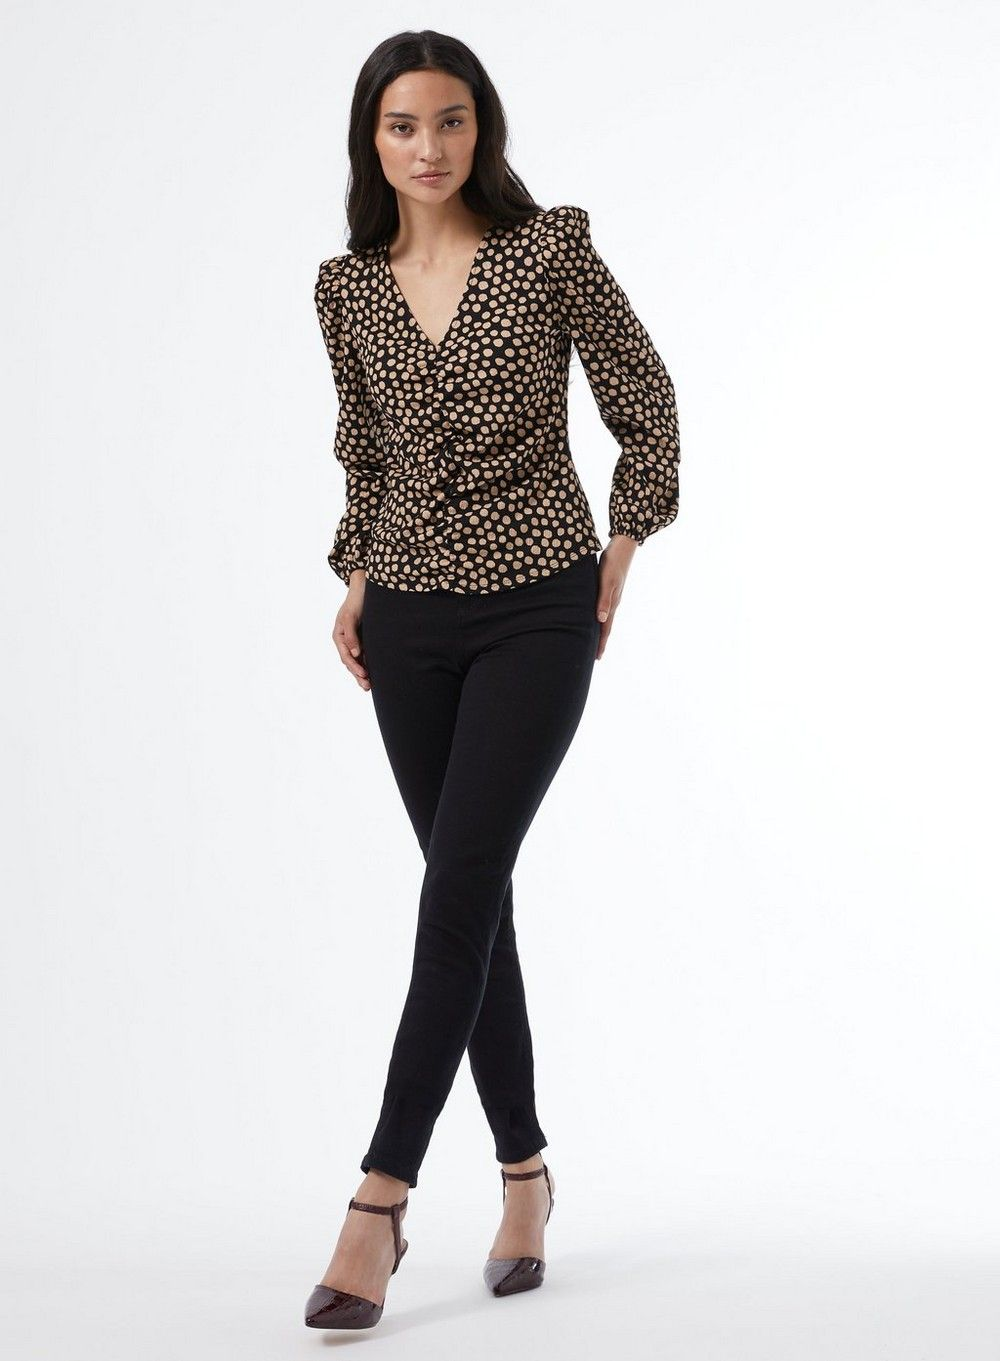 Dorothy Perkins Womens Petite Black Spot Rouched Top Blouse Elegant V-Neck